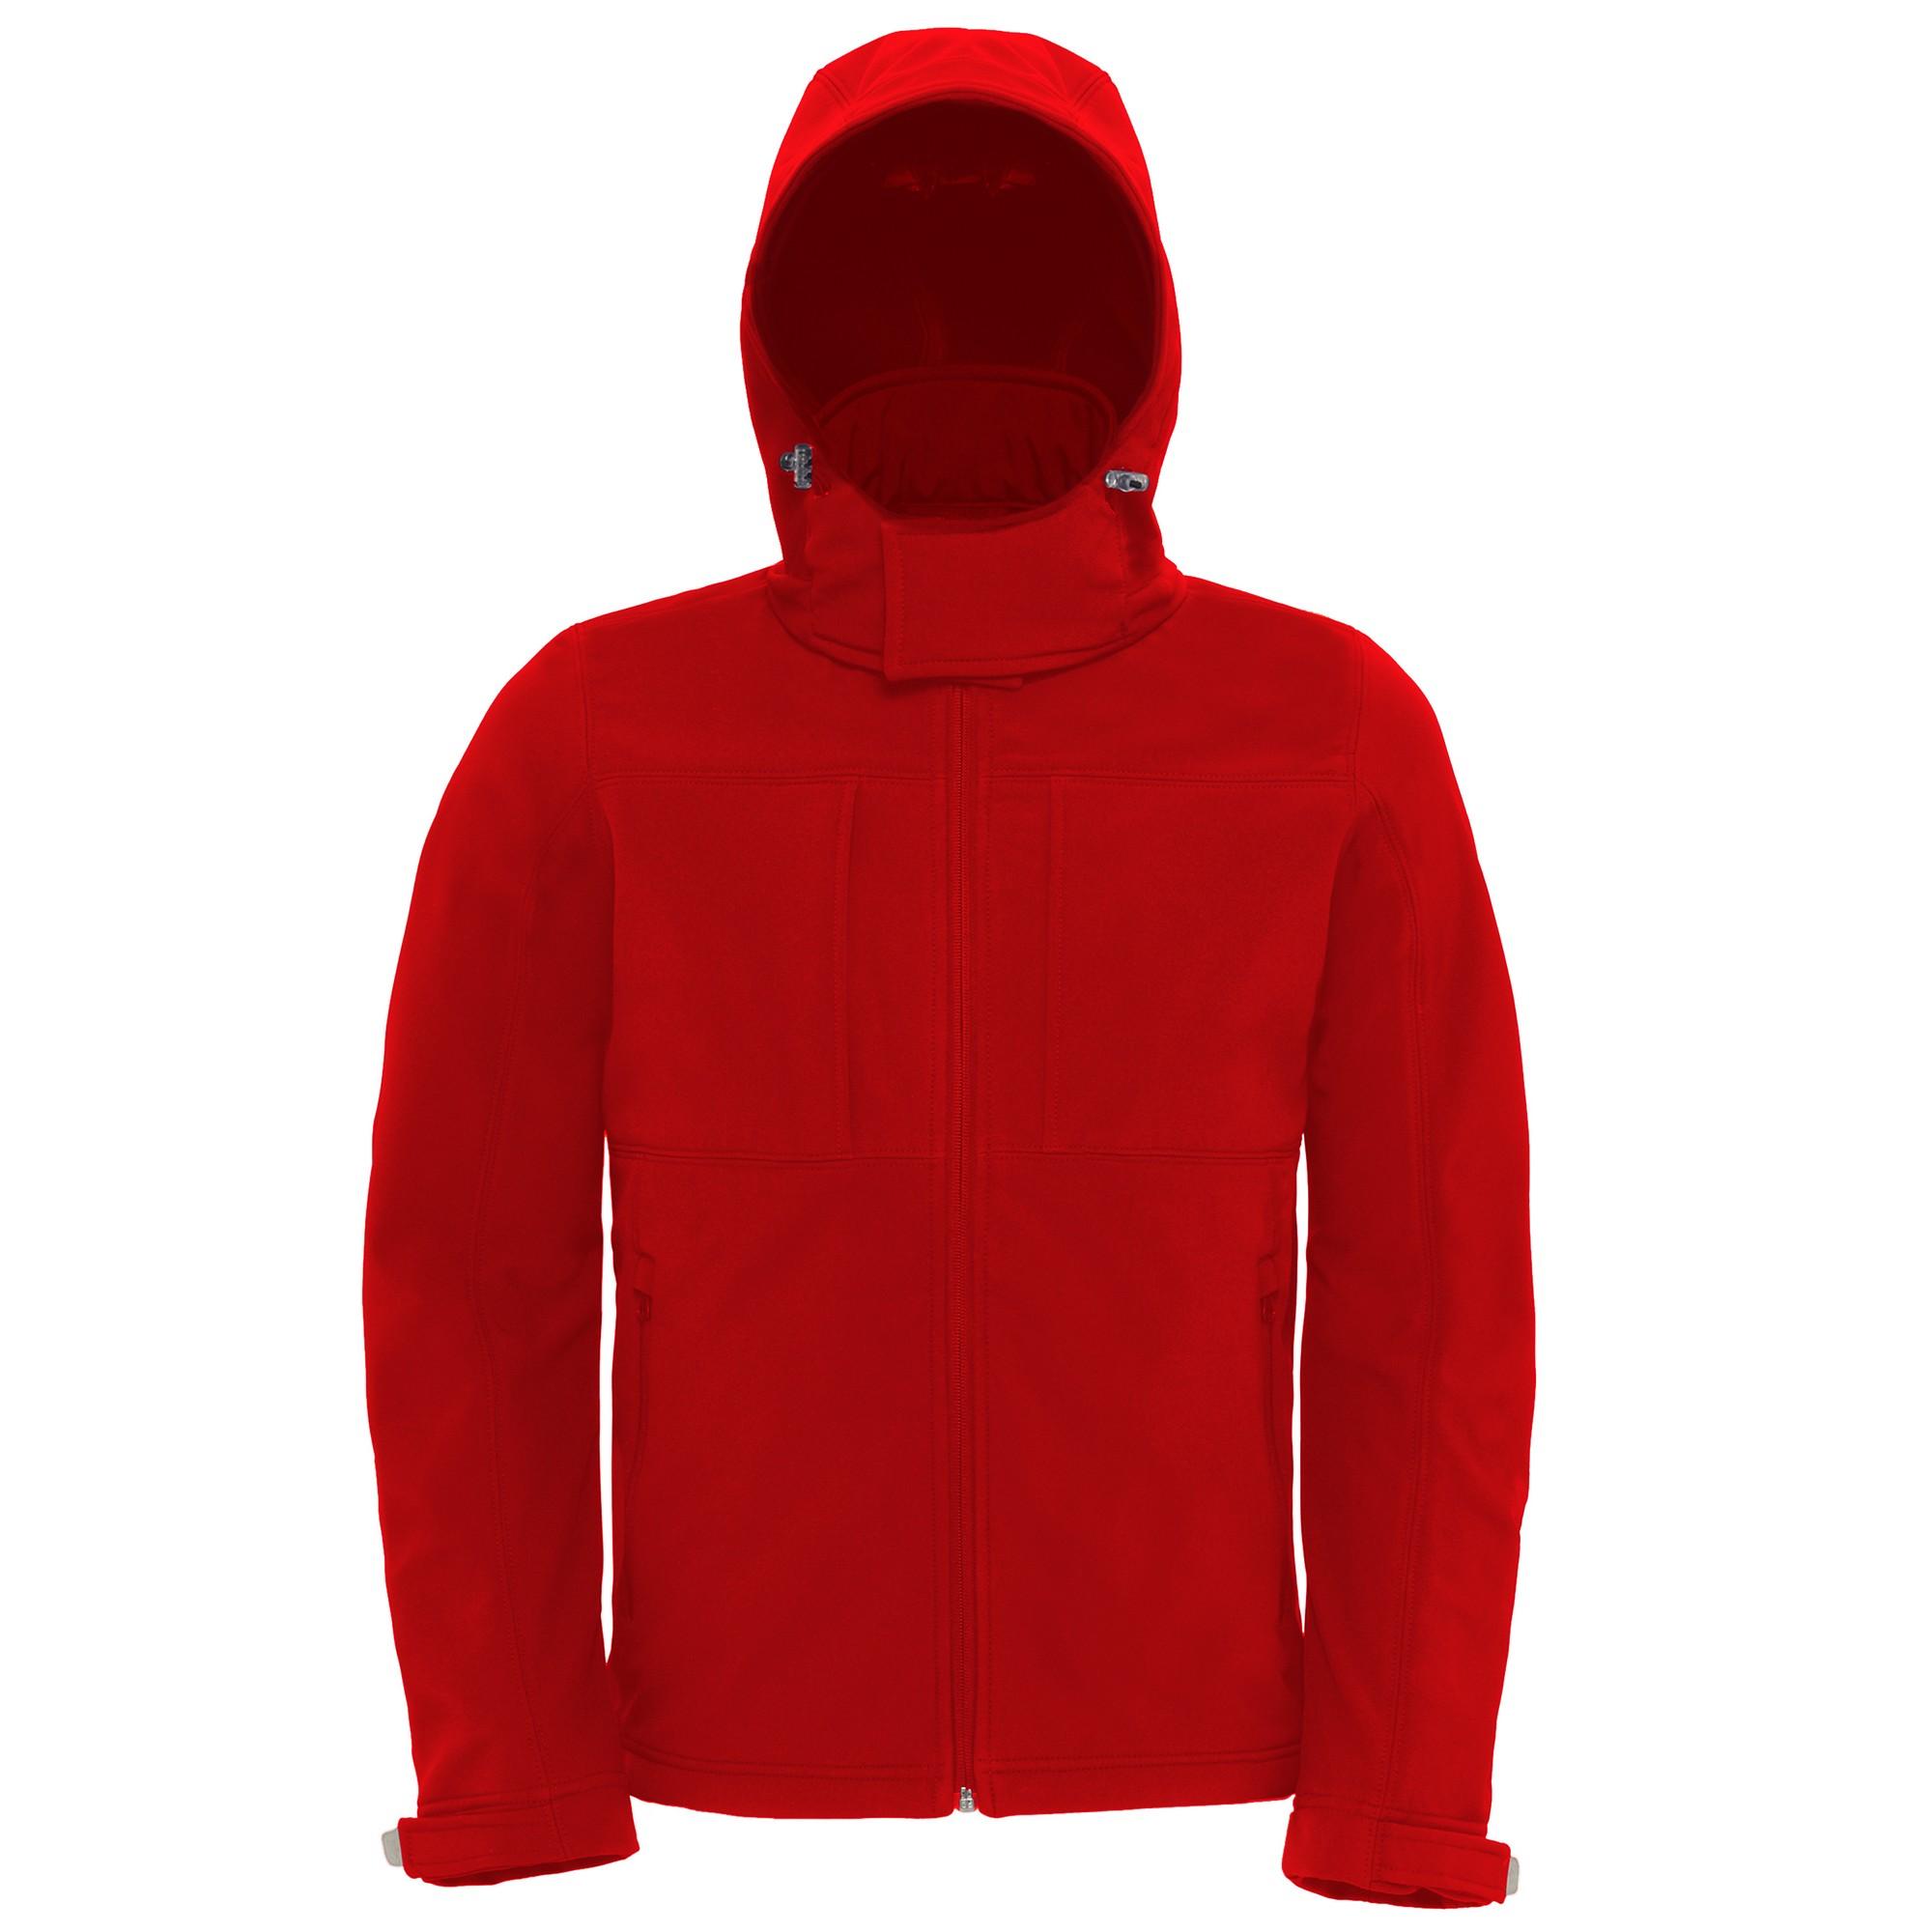 B&C Mens Hooded Softshell Breathable, Waterproof & Windproof Jacket (Fleece Lining) (S) (Black)